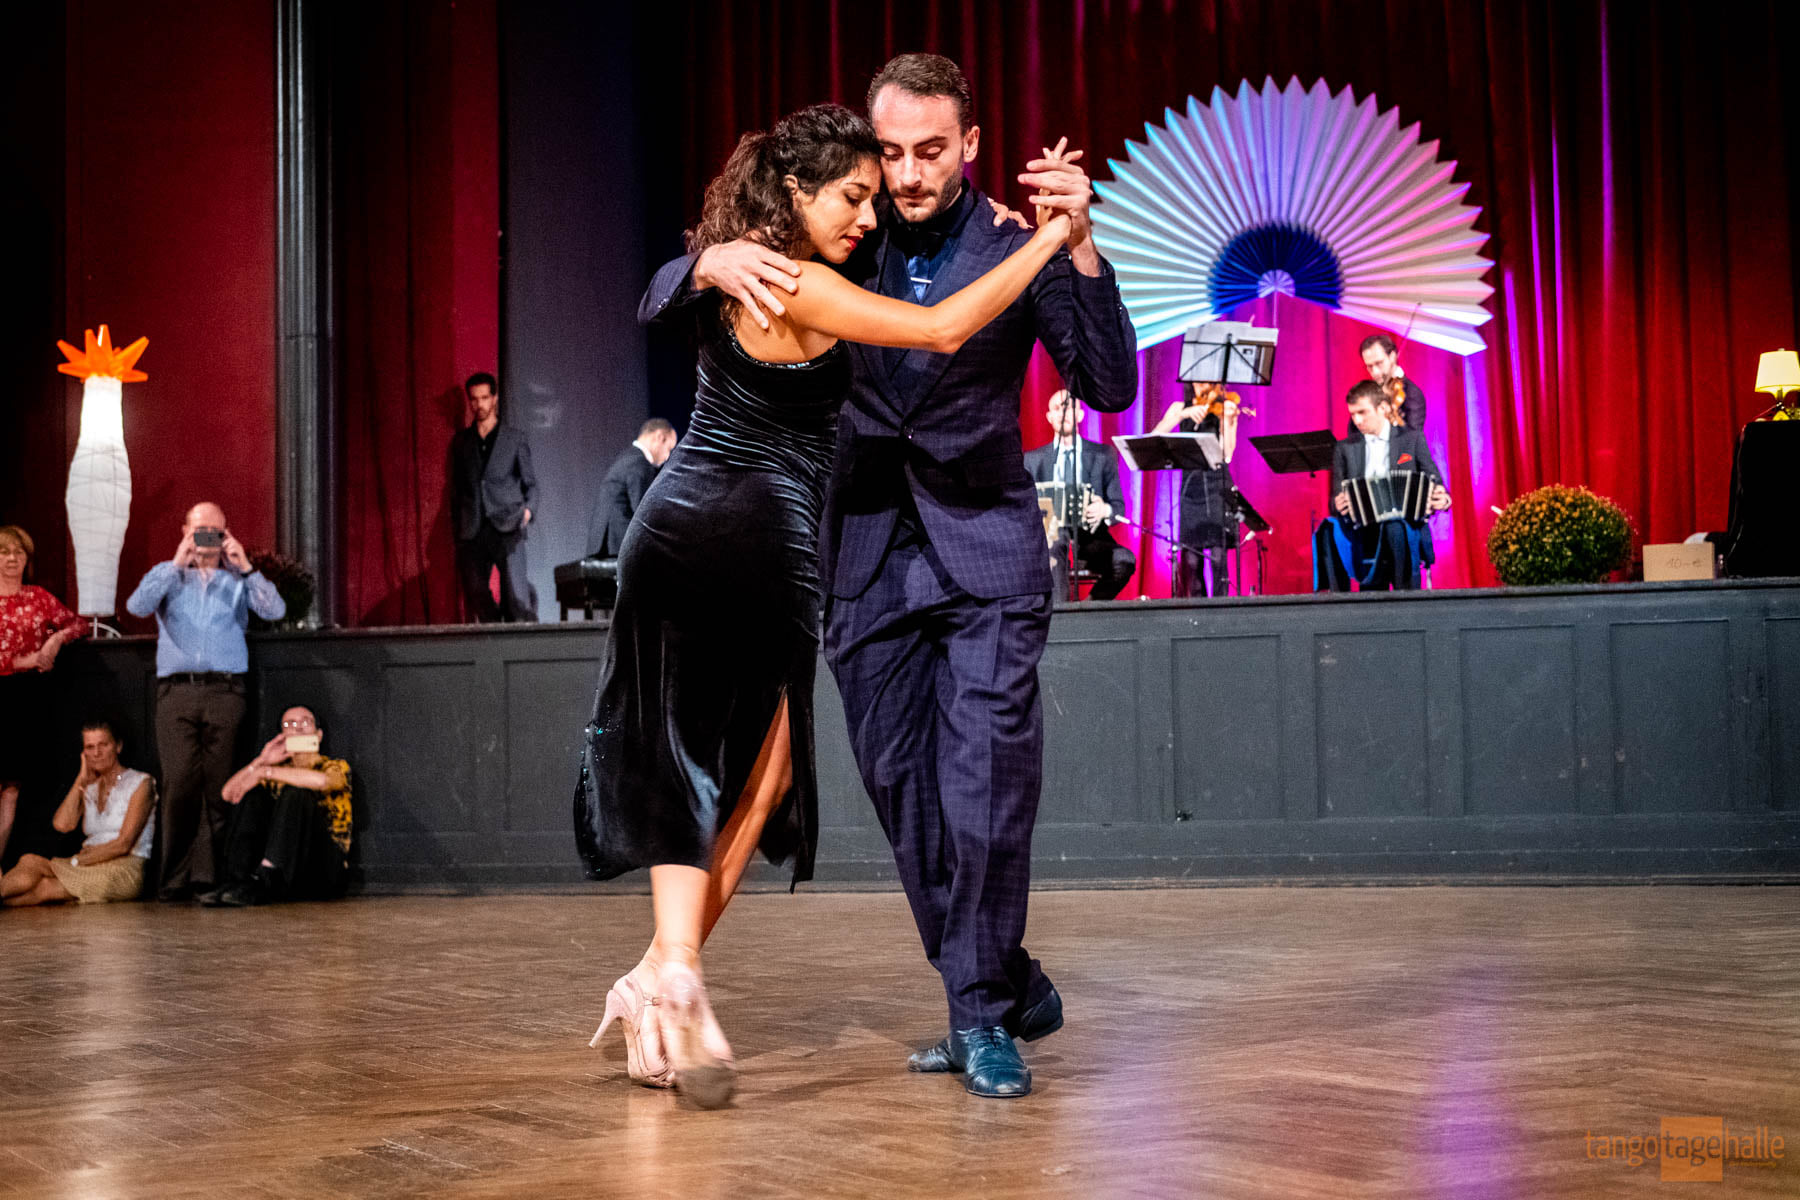 Lorena Tarantino & Gianpiero Galdi, 16. TangoTageHalle 2019, Halle (Saale), Germany